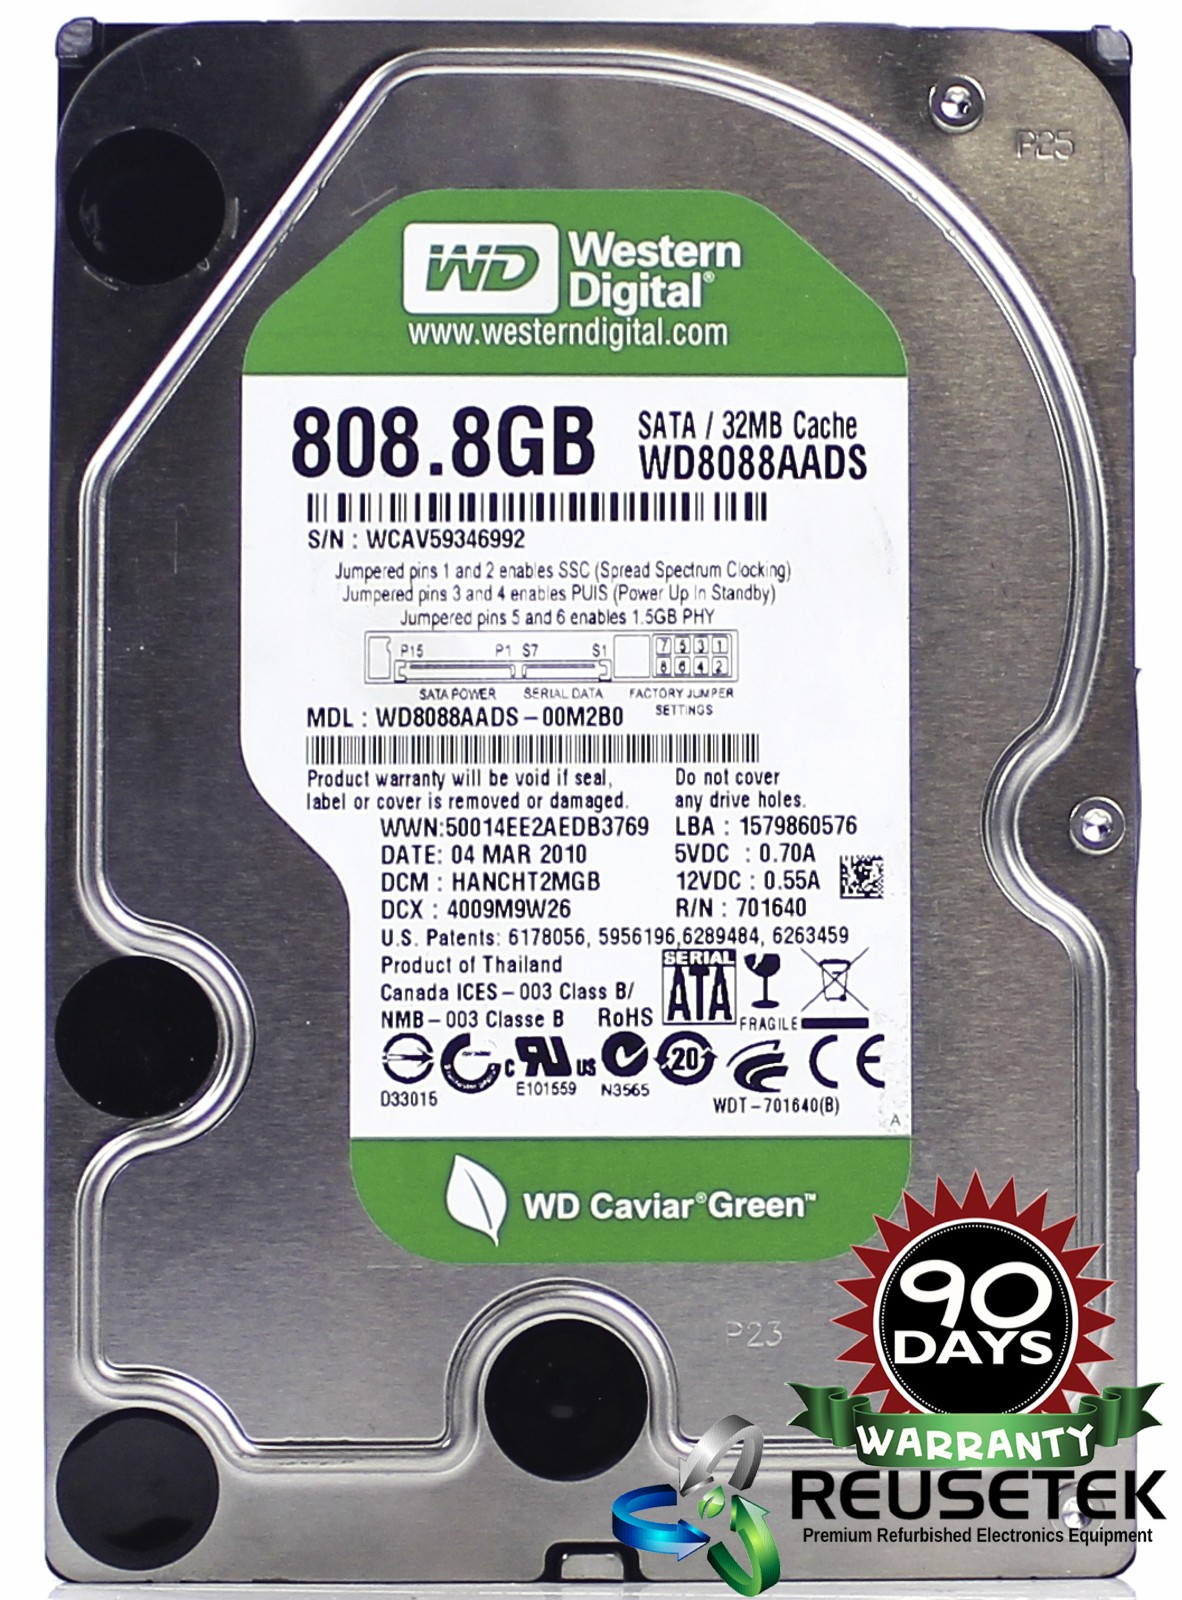 "100257-SN12346985-Western Digital WD8088AADS-00M2B0 DCM: HANCHT2MGB 808.8GB 3.5"" Sata Hard Drive-image"